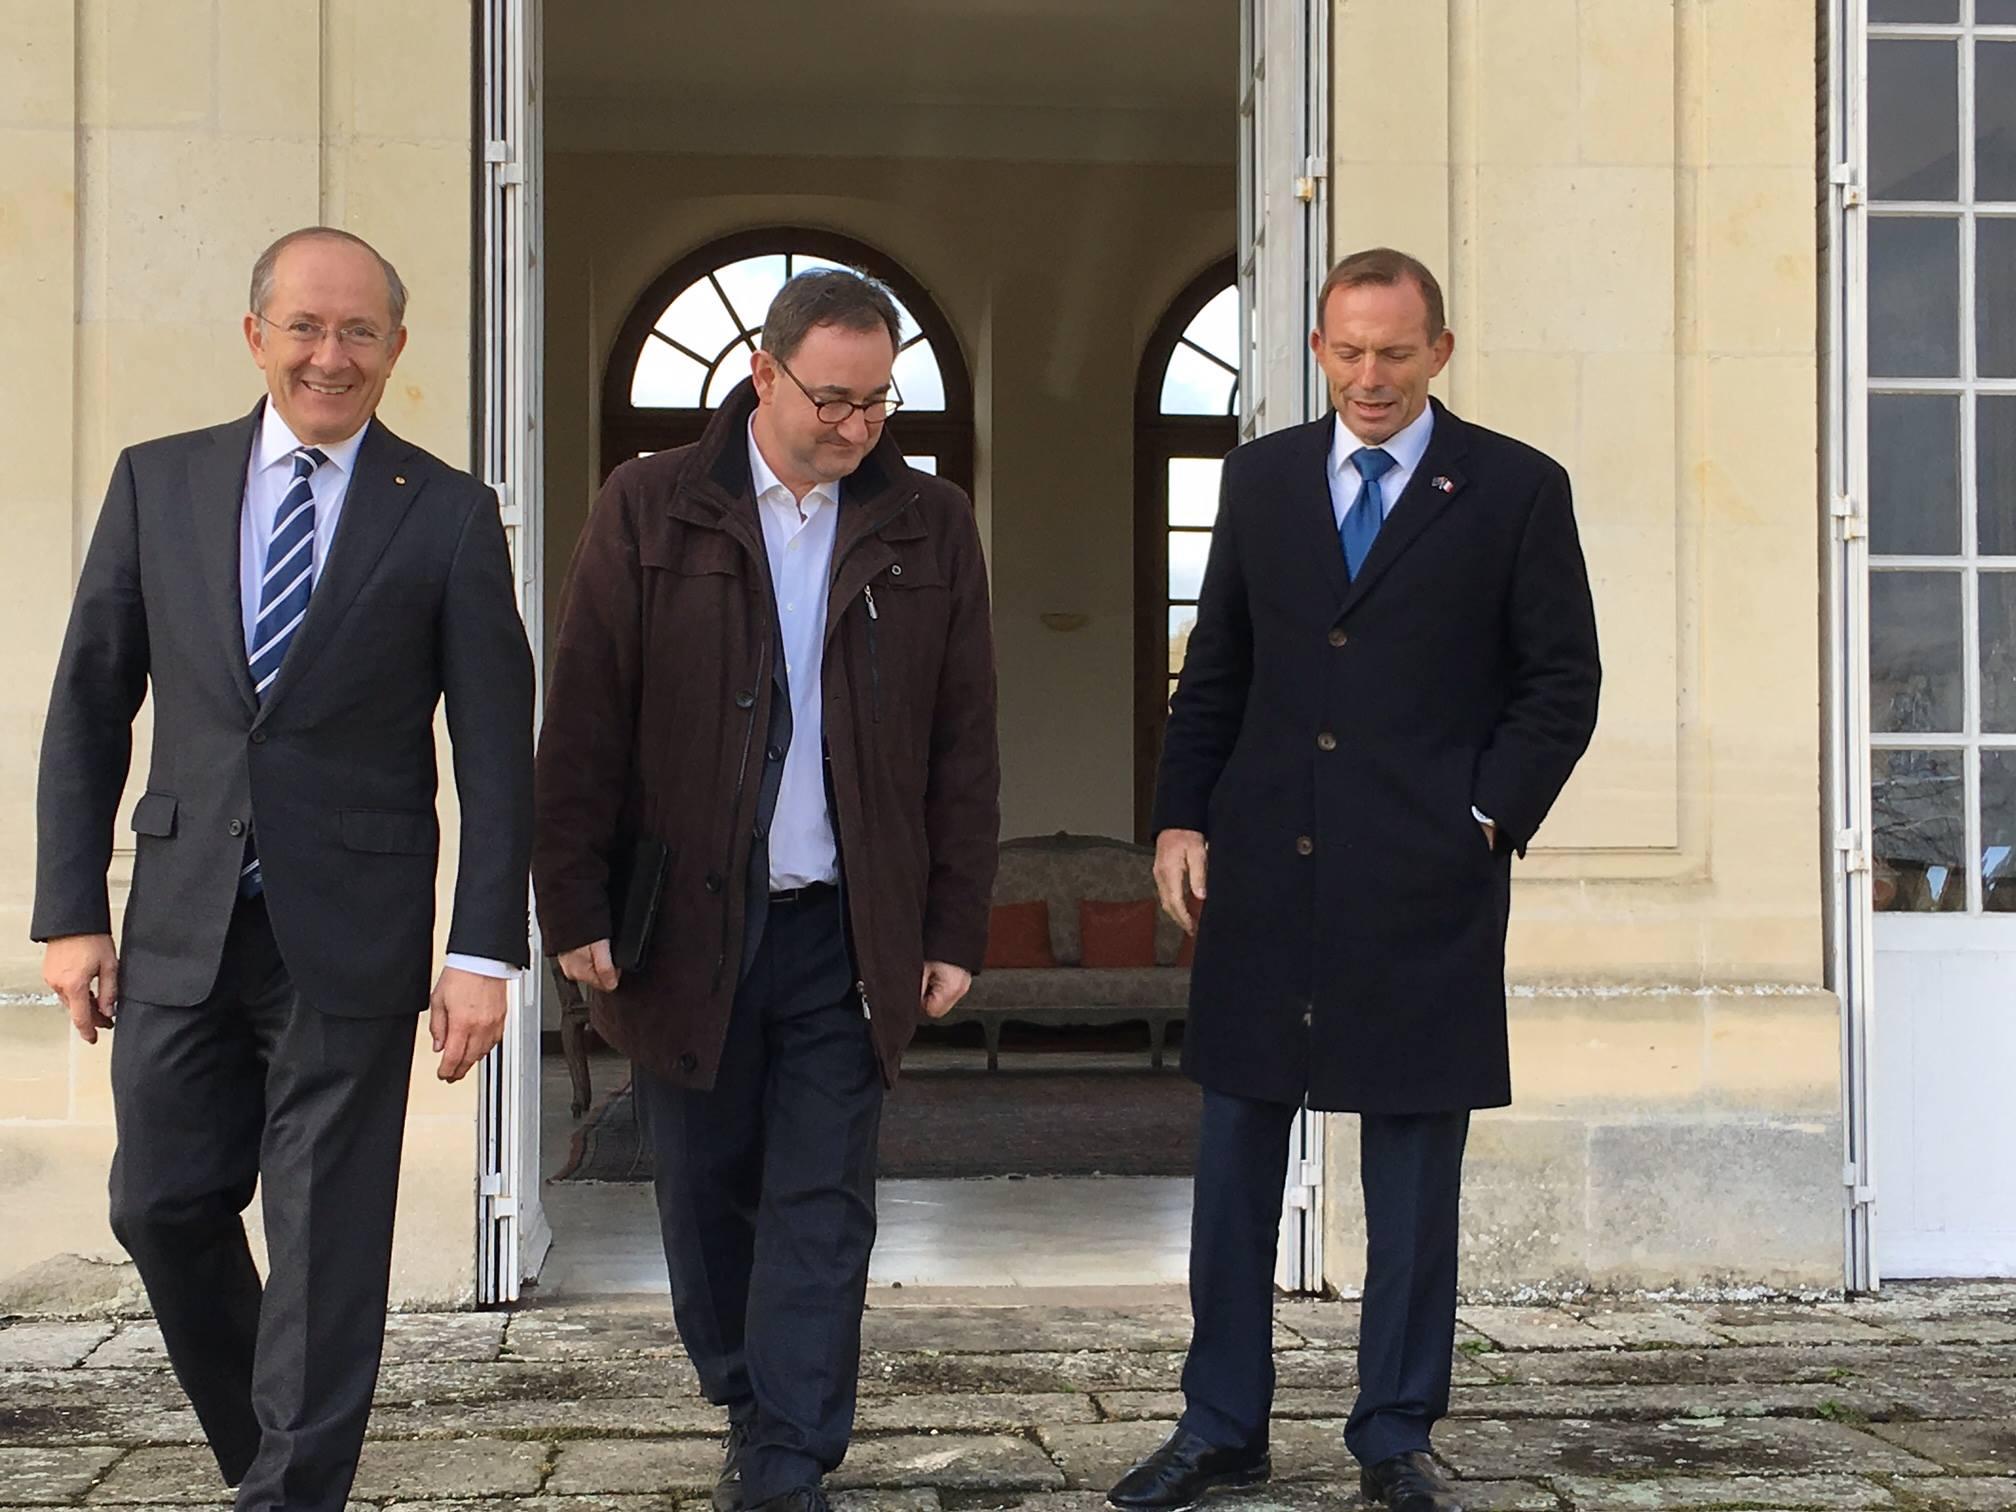 SEM l'Ambassadeur d'Australie Stephen Brady - Stanislas de Clermont-Tonnerre - PM Tony Abbott